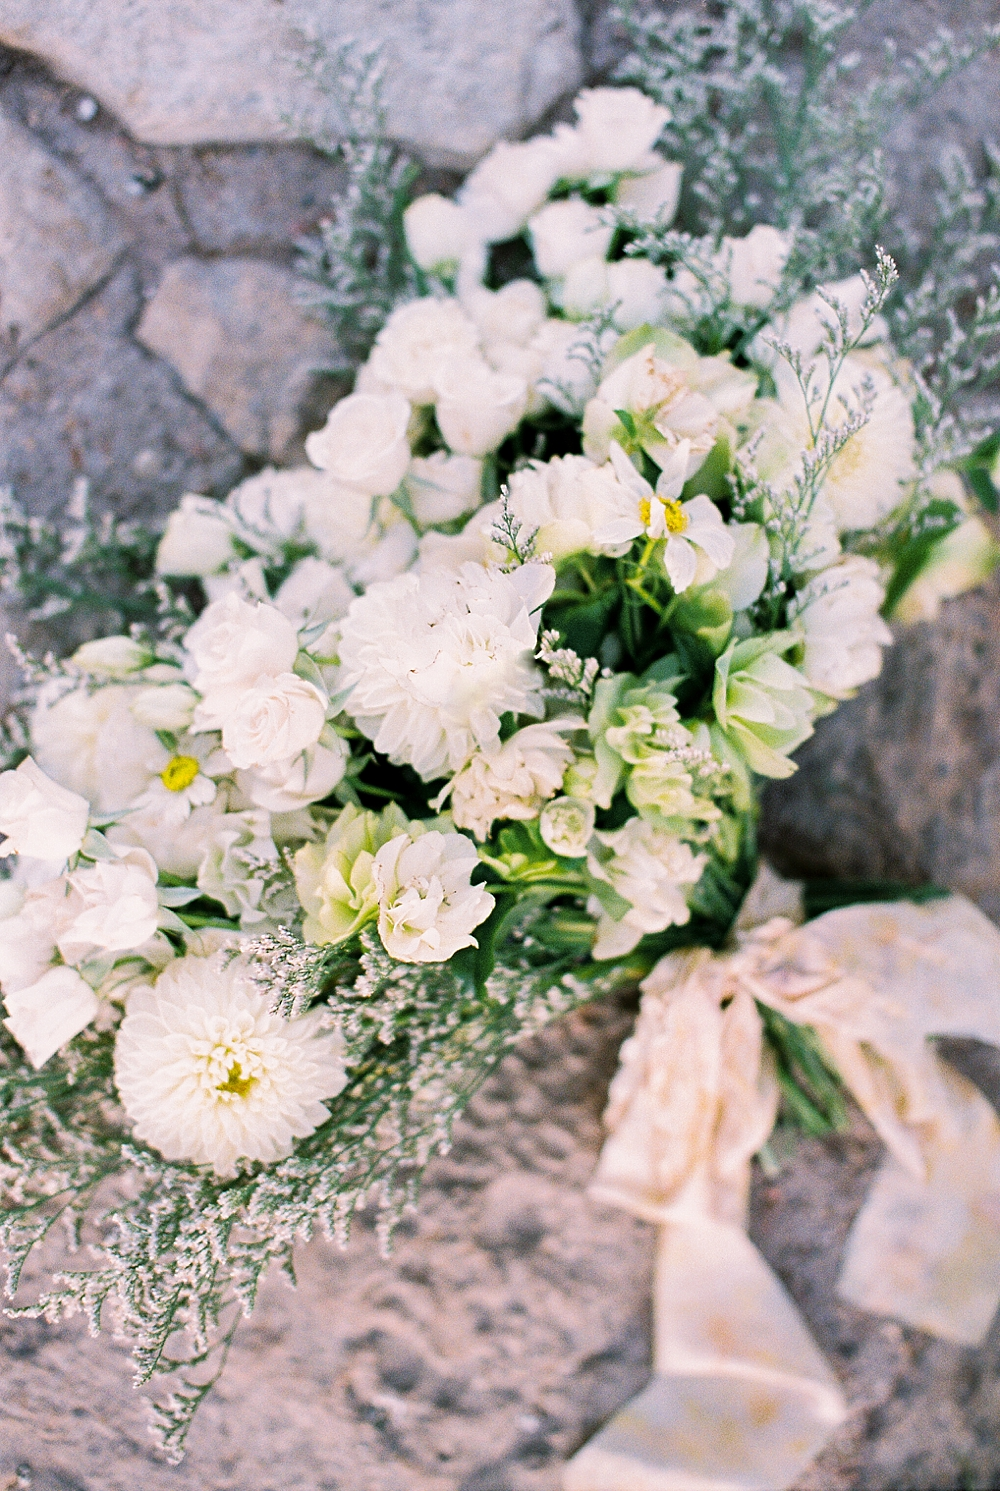 kristin-la-voie-photography-AUSTIN-wedding-BOUDOIR-photographer-40